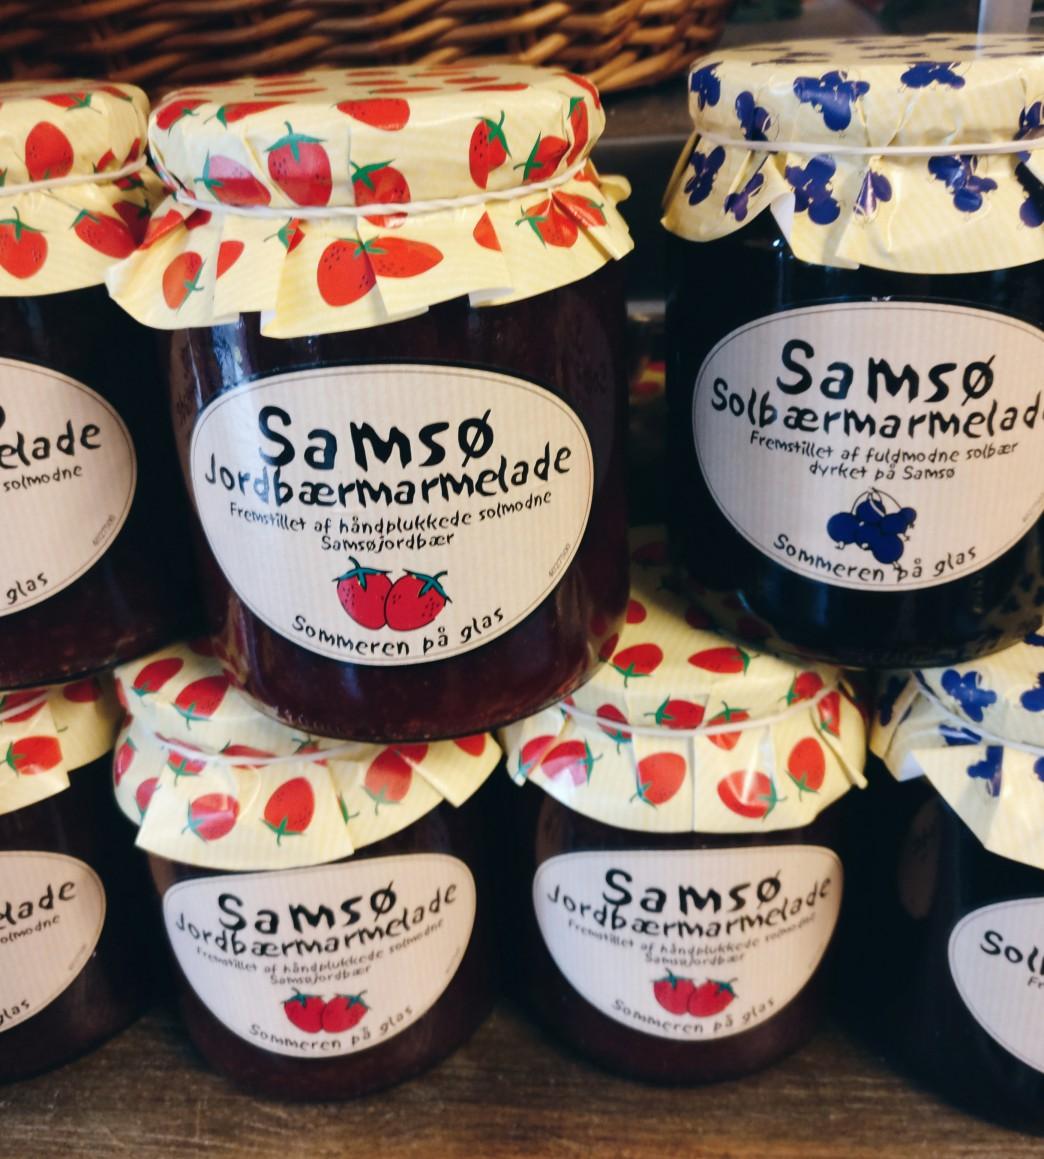 Samsø marmelade